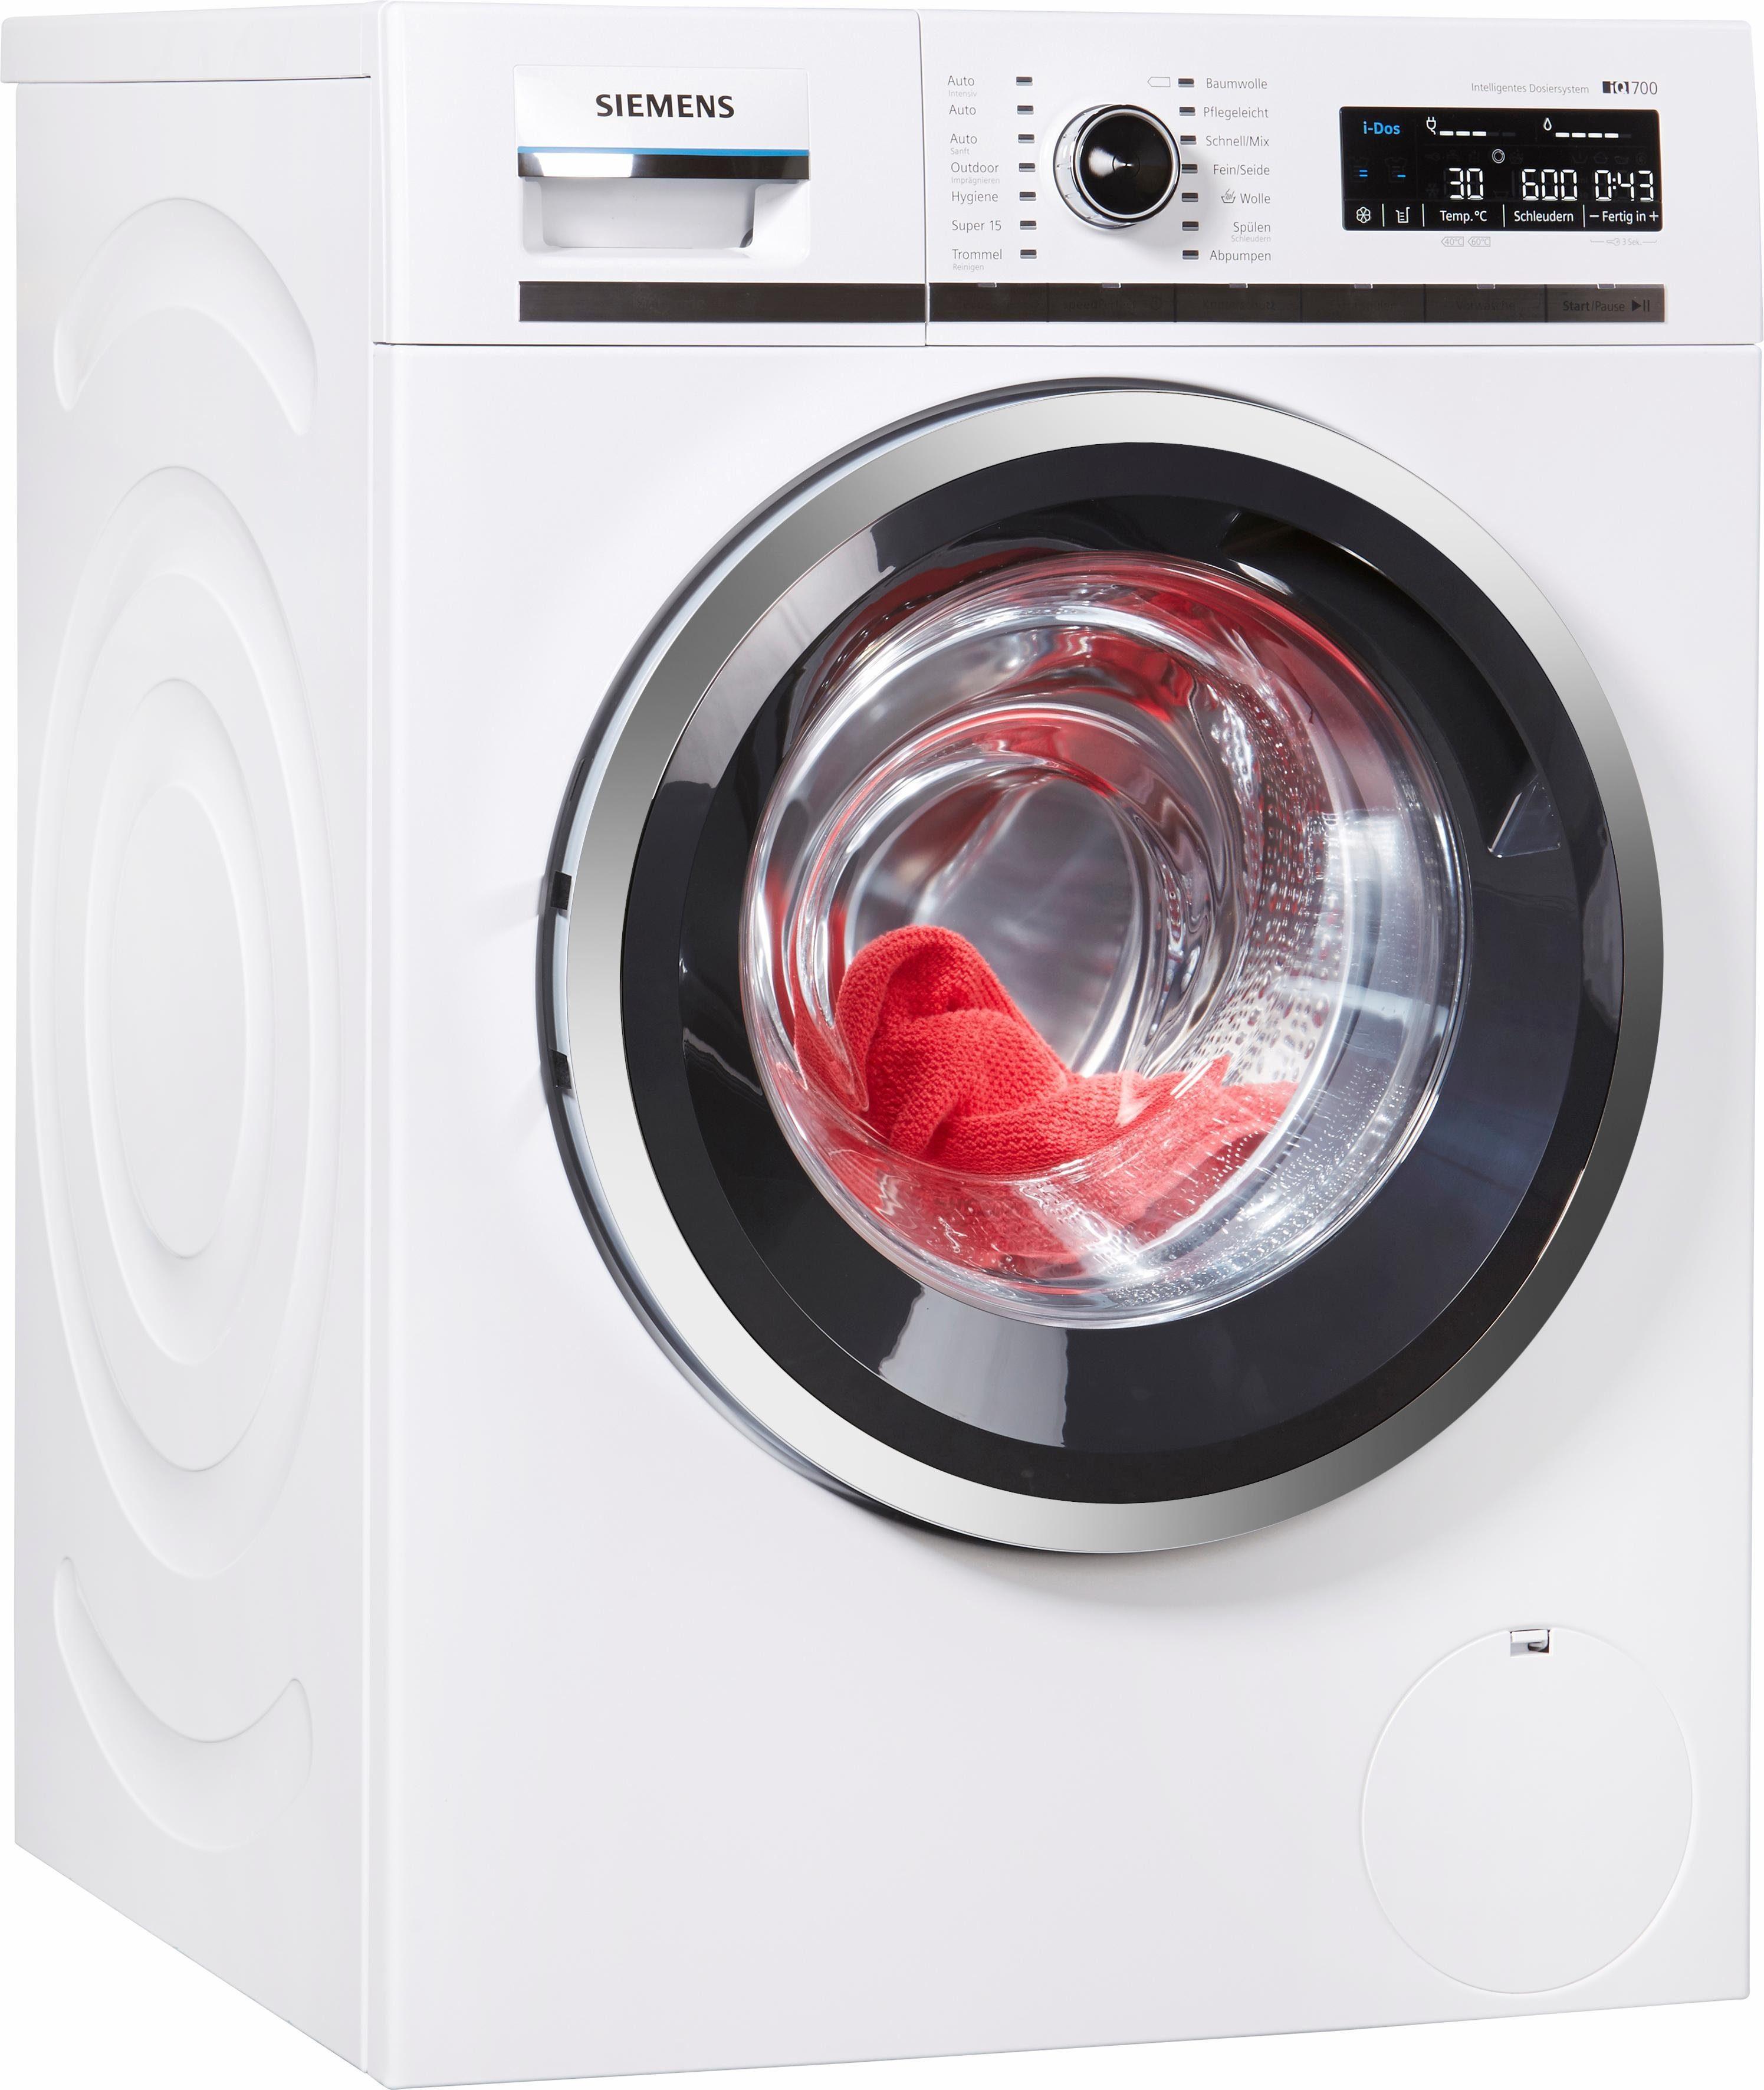 SIEMENS Waschmaschine WM16W6A1, 9 kg, 1600 U/Min